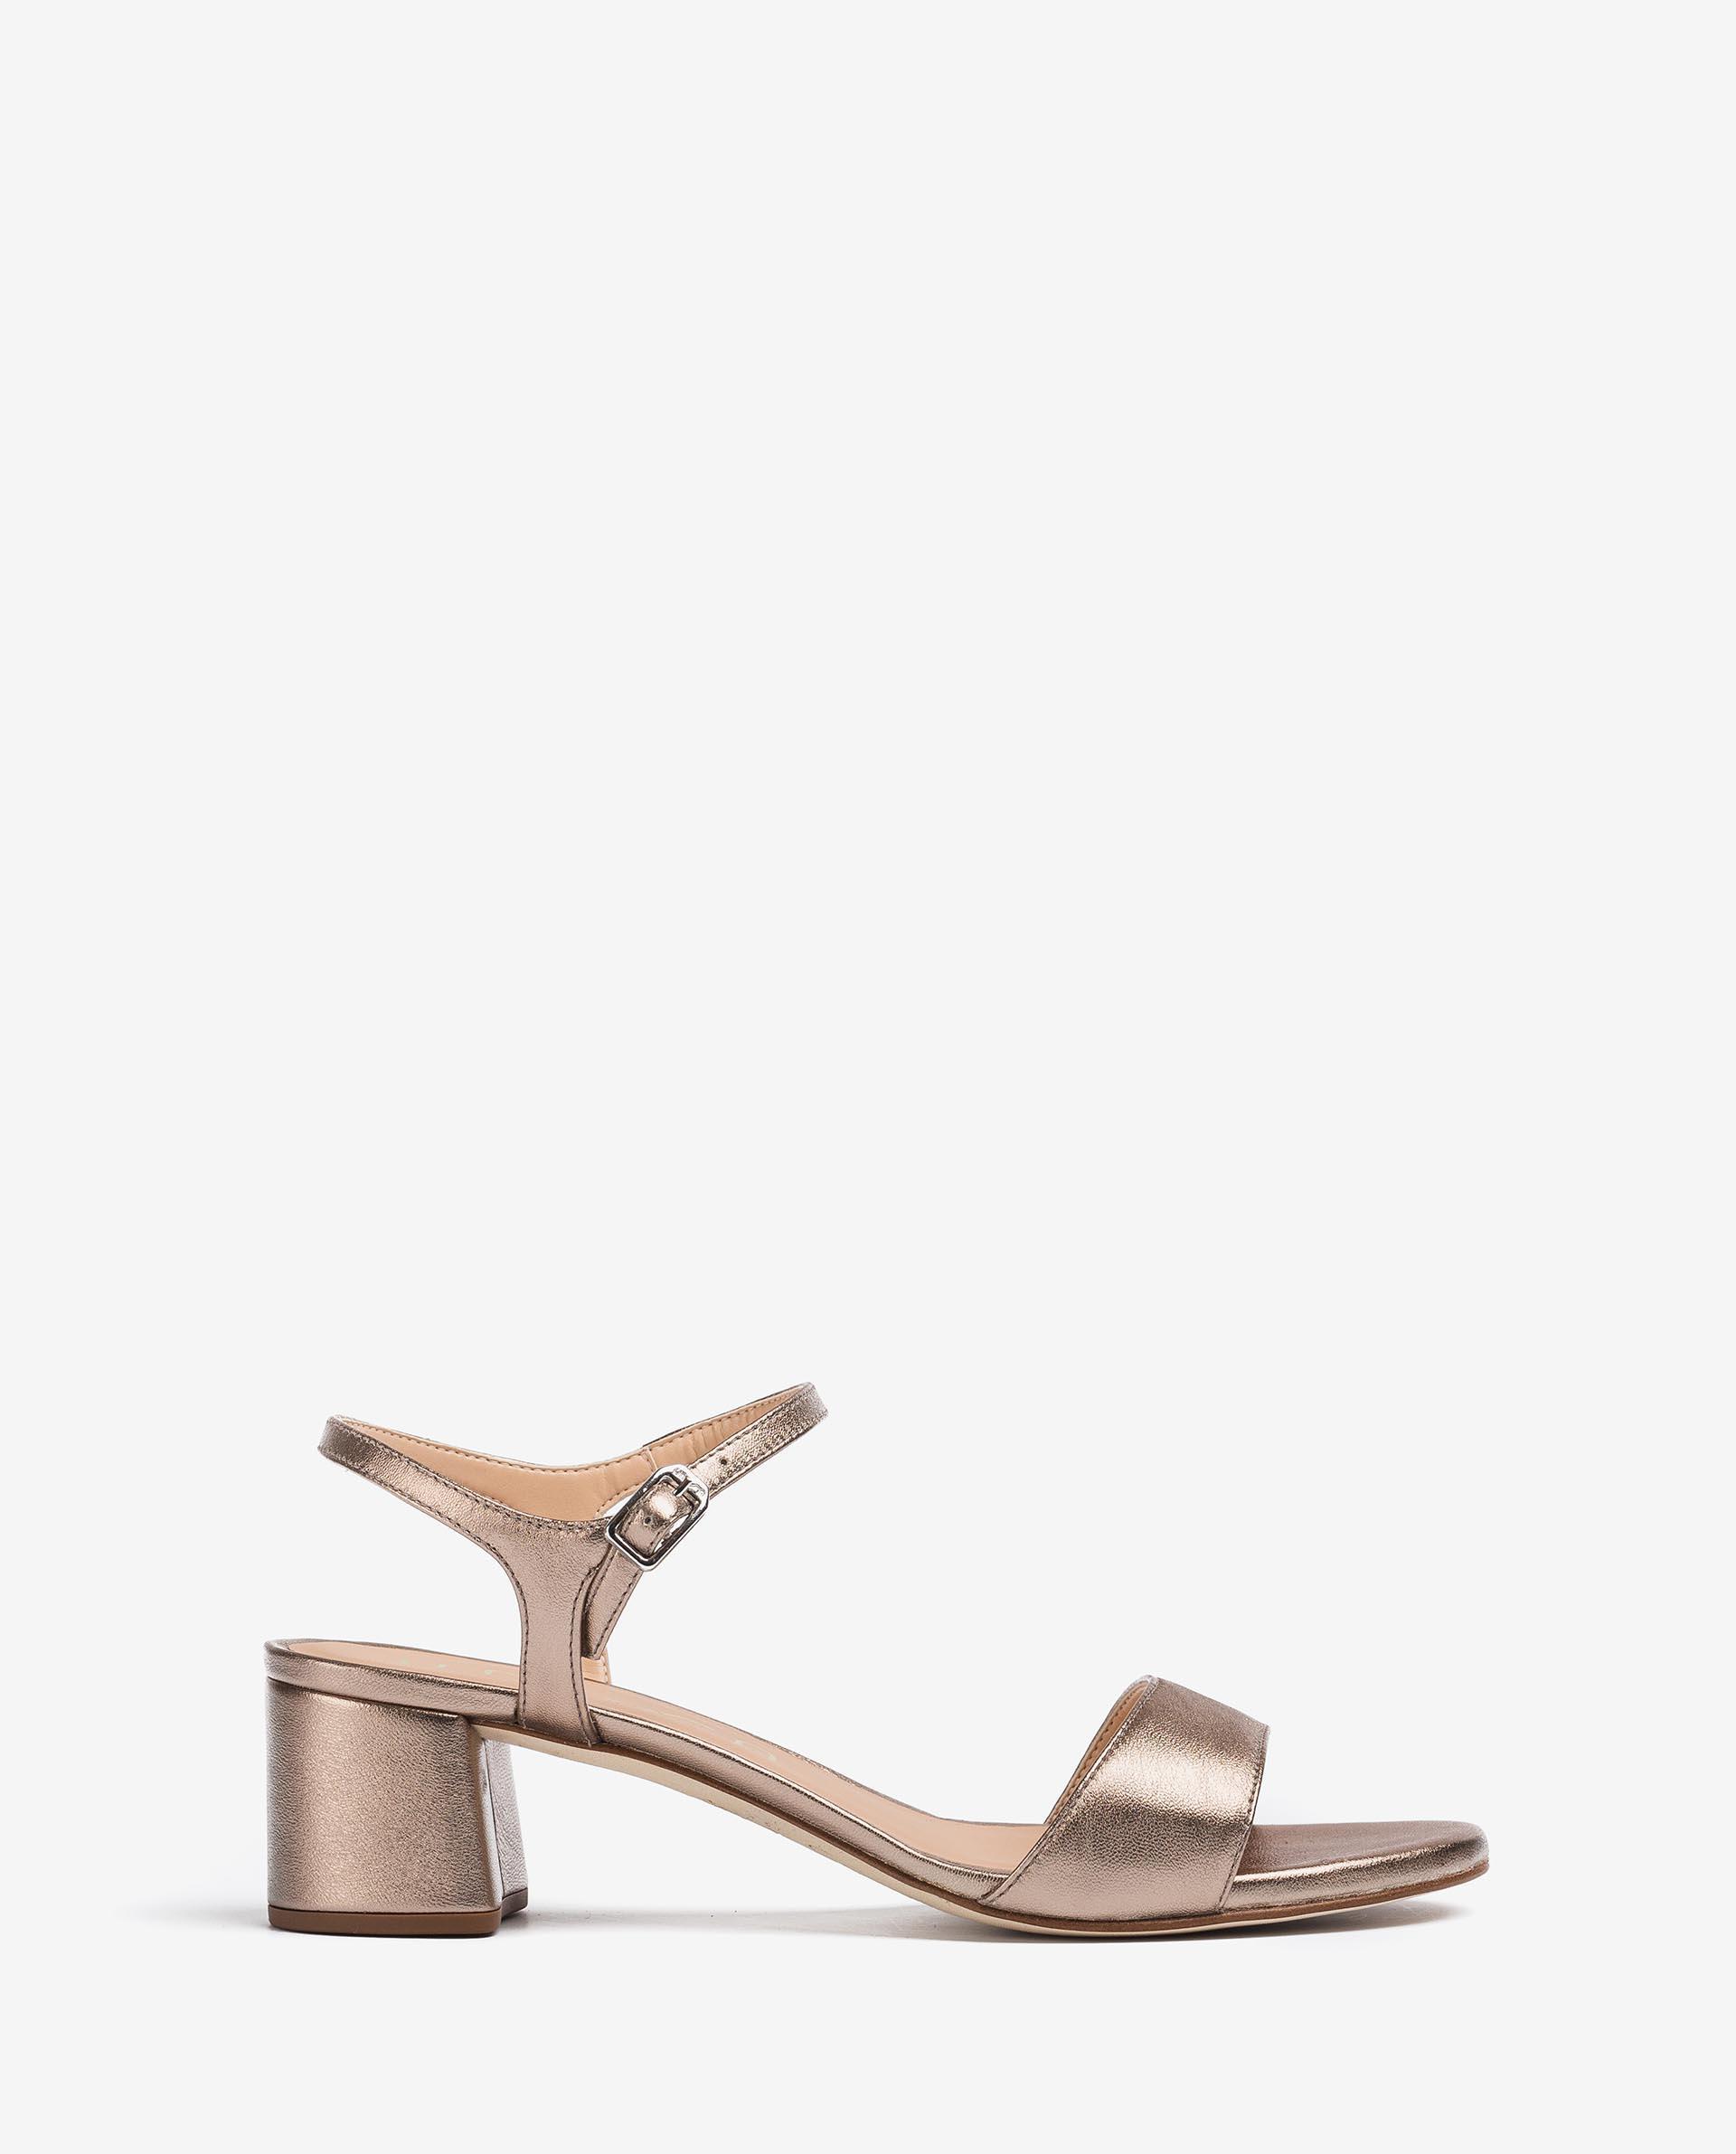 UNISA Metal effect leather sandals with wide heel GENTO_21_LMT 2